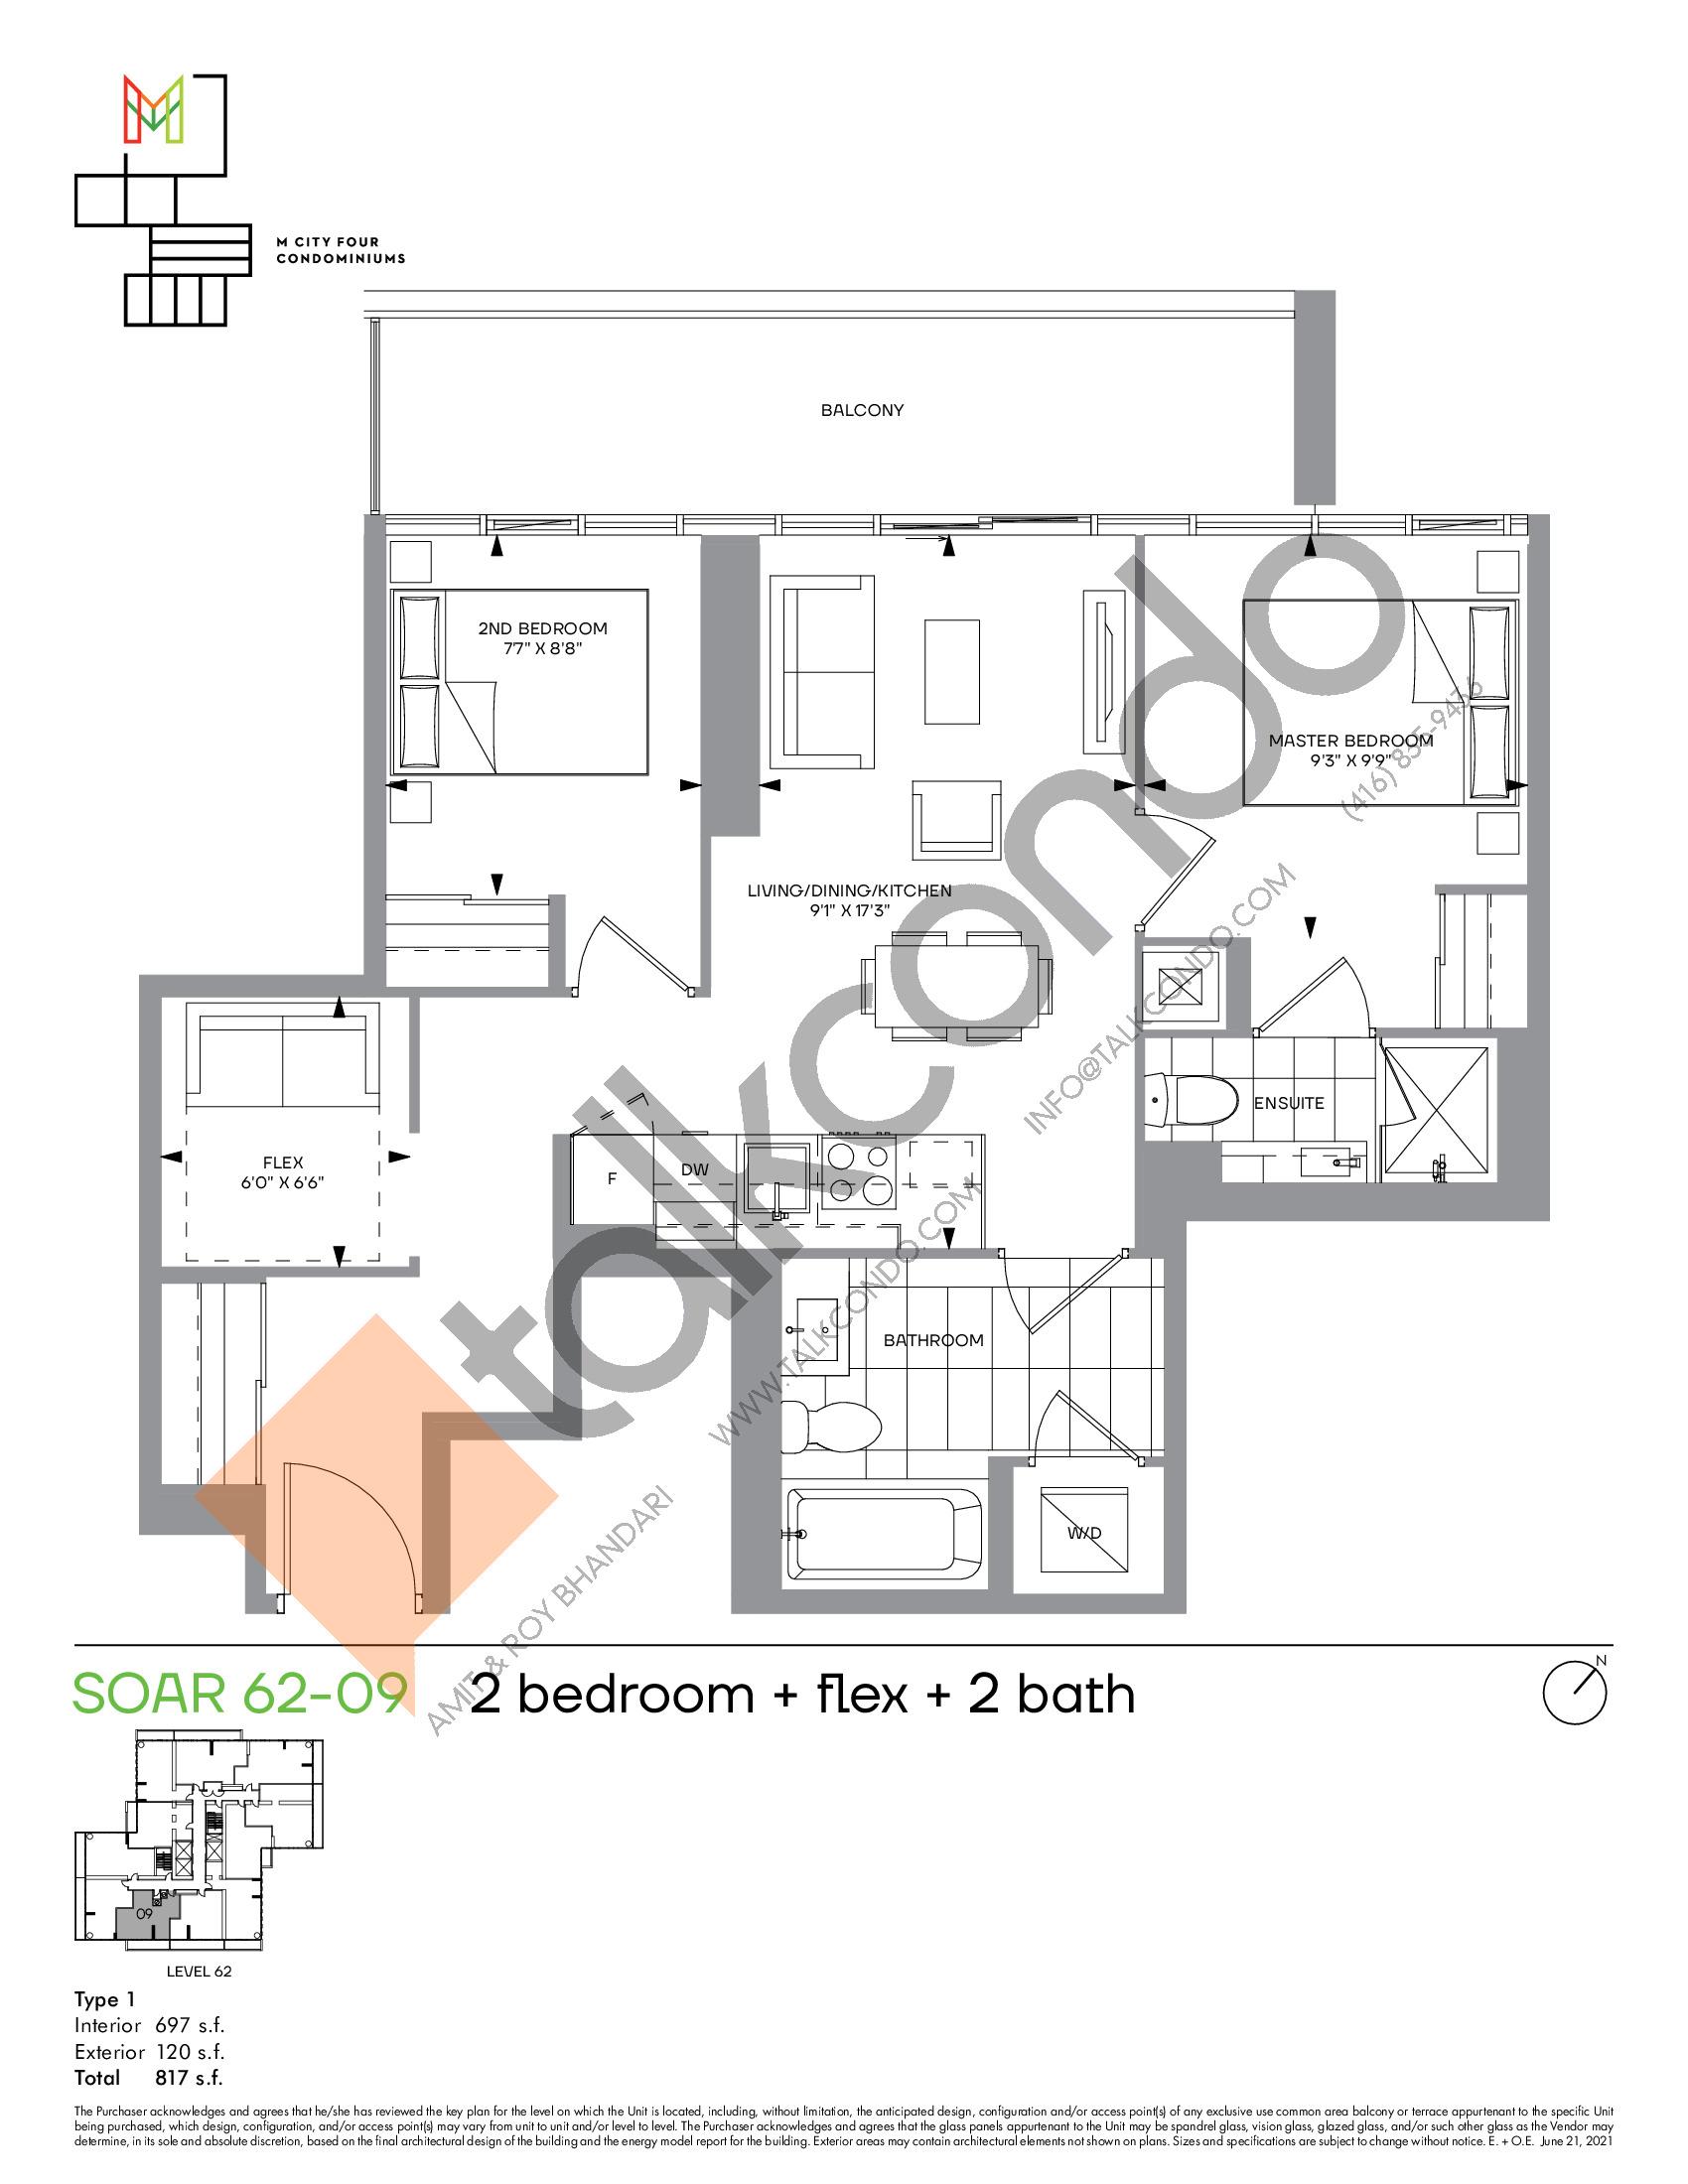 Soar 62-09 Floor Plan at M4 Condos - 697 sq.ft